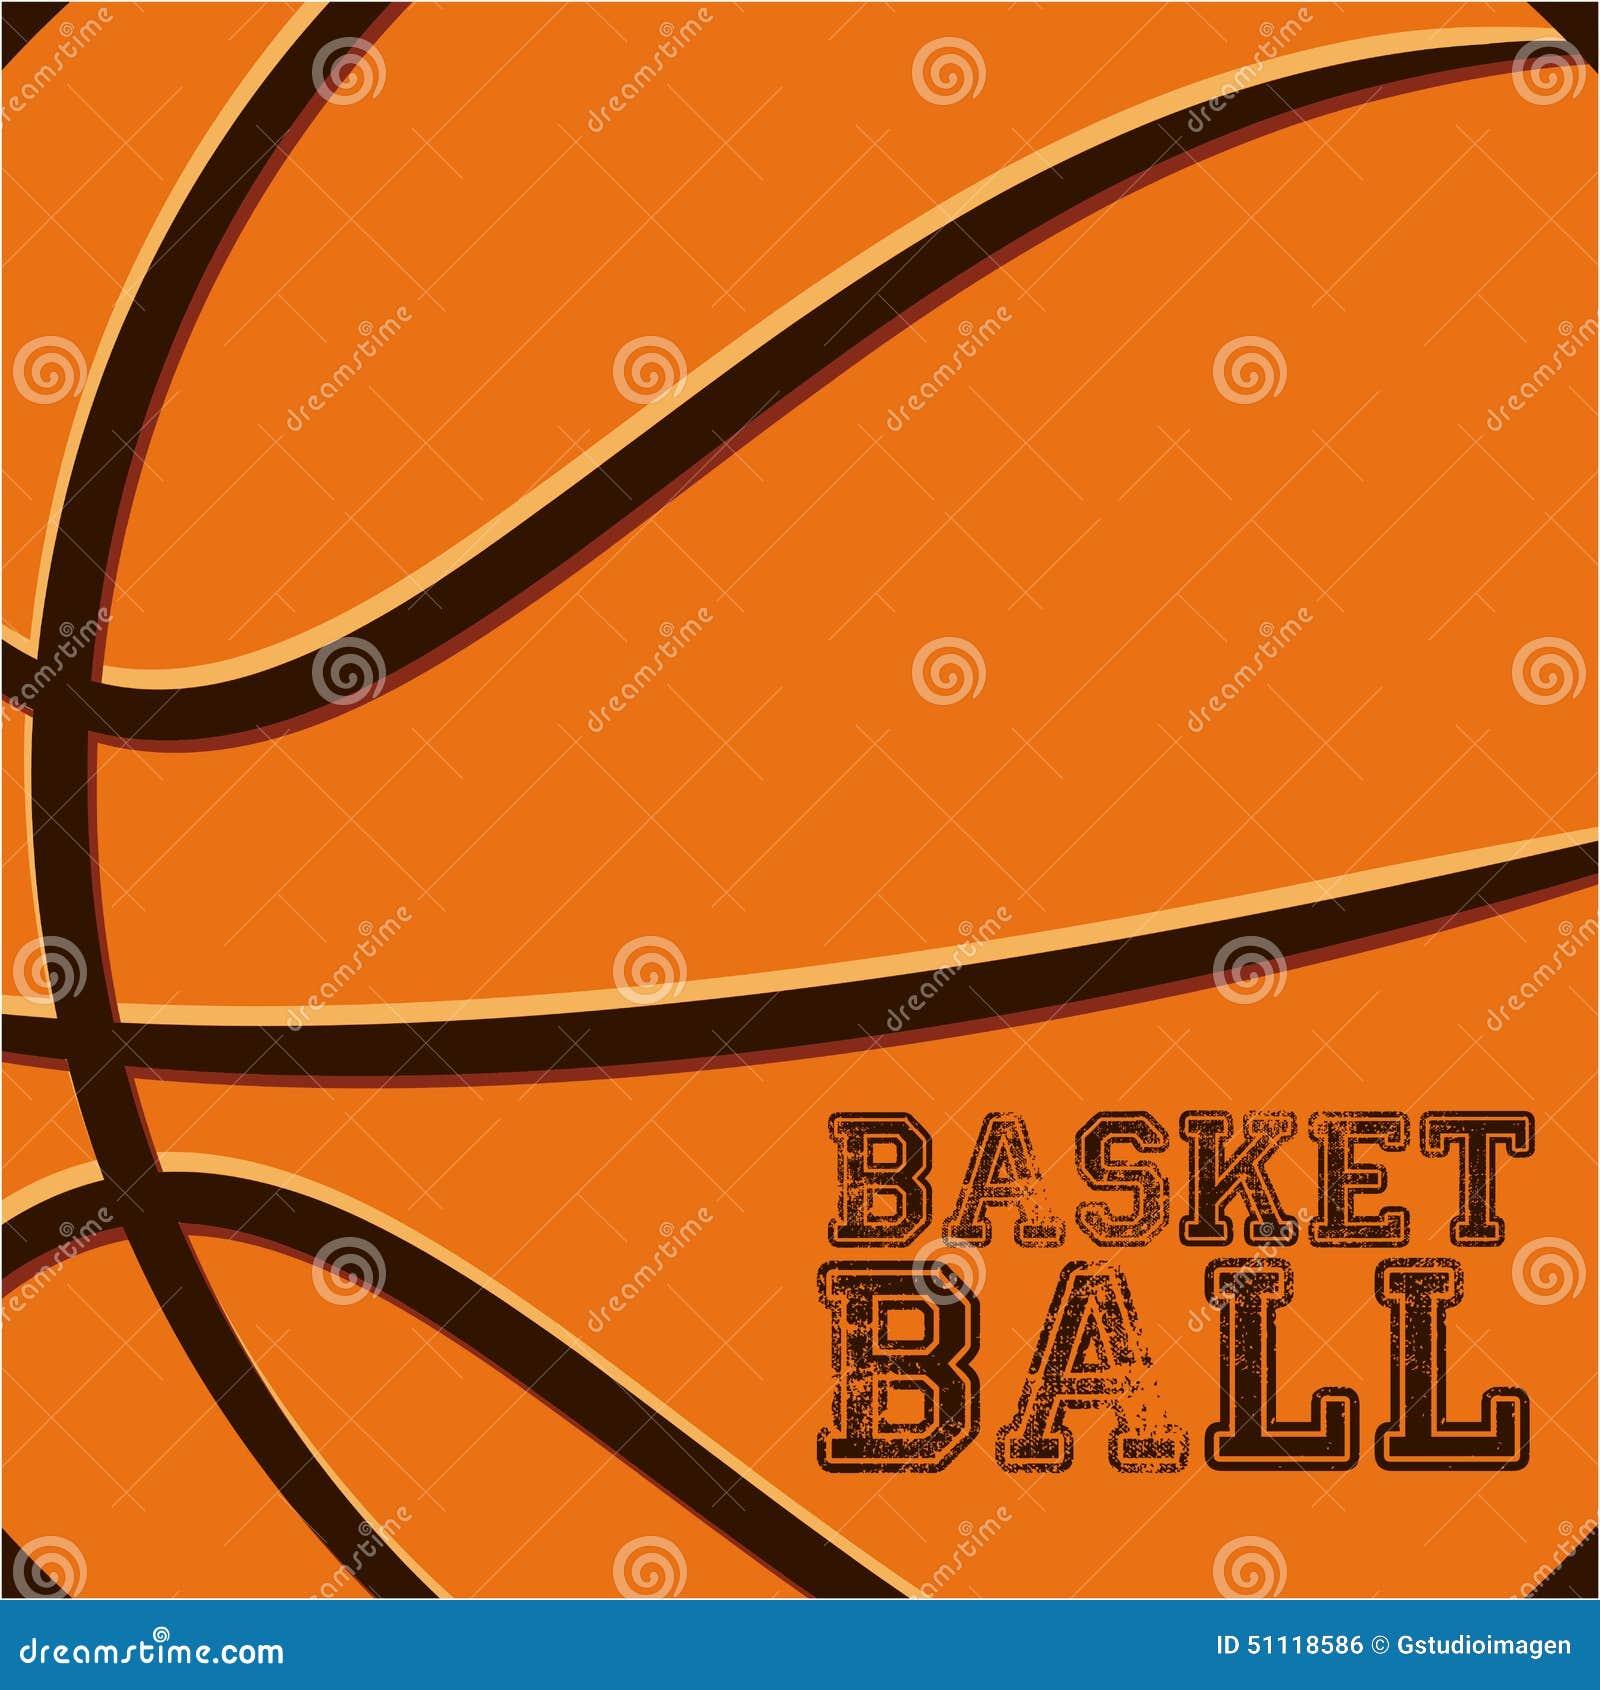 Basketballsport